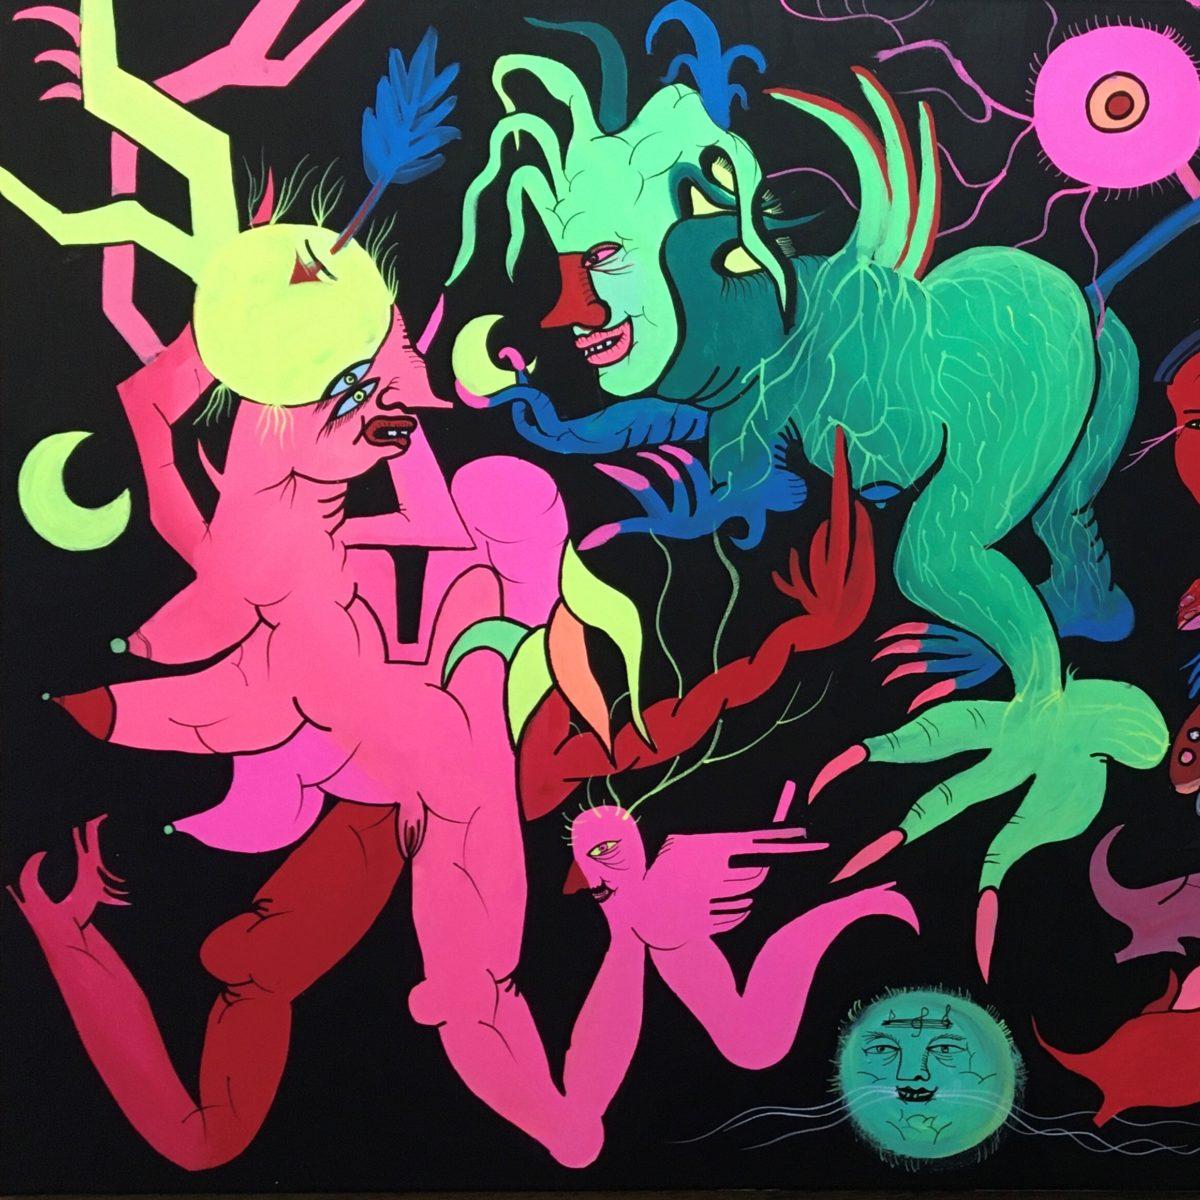 Ale sztuka! - Uglyika. Malarstwo i rysunek - wystawa online